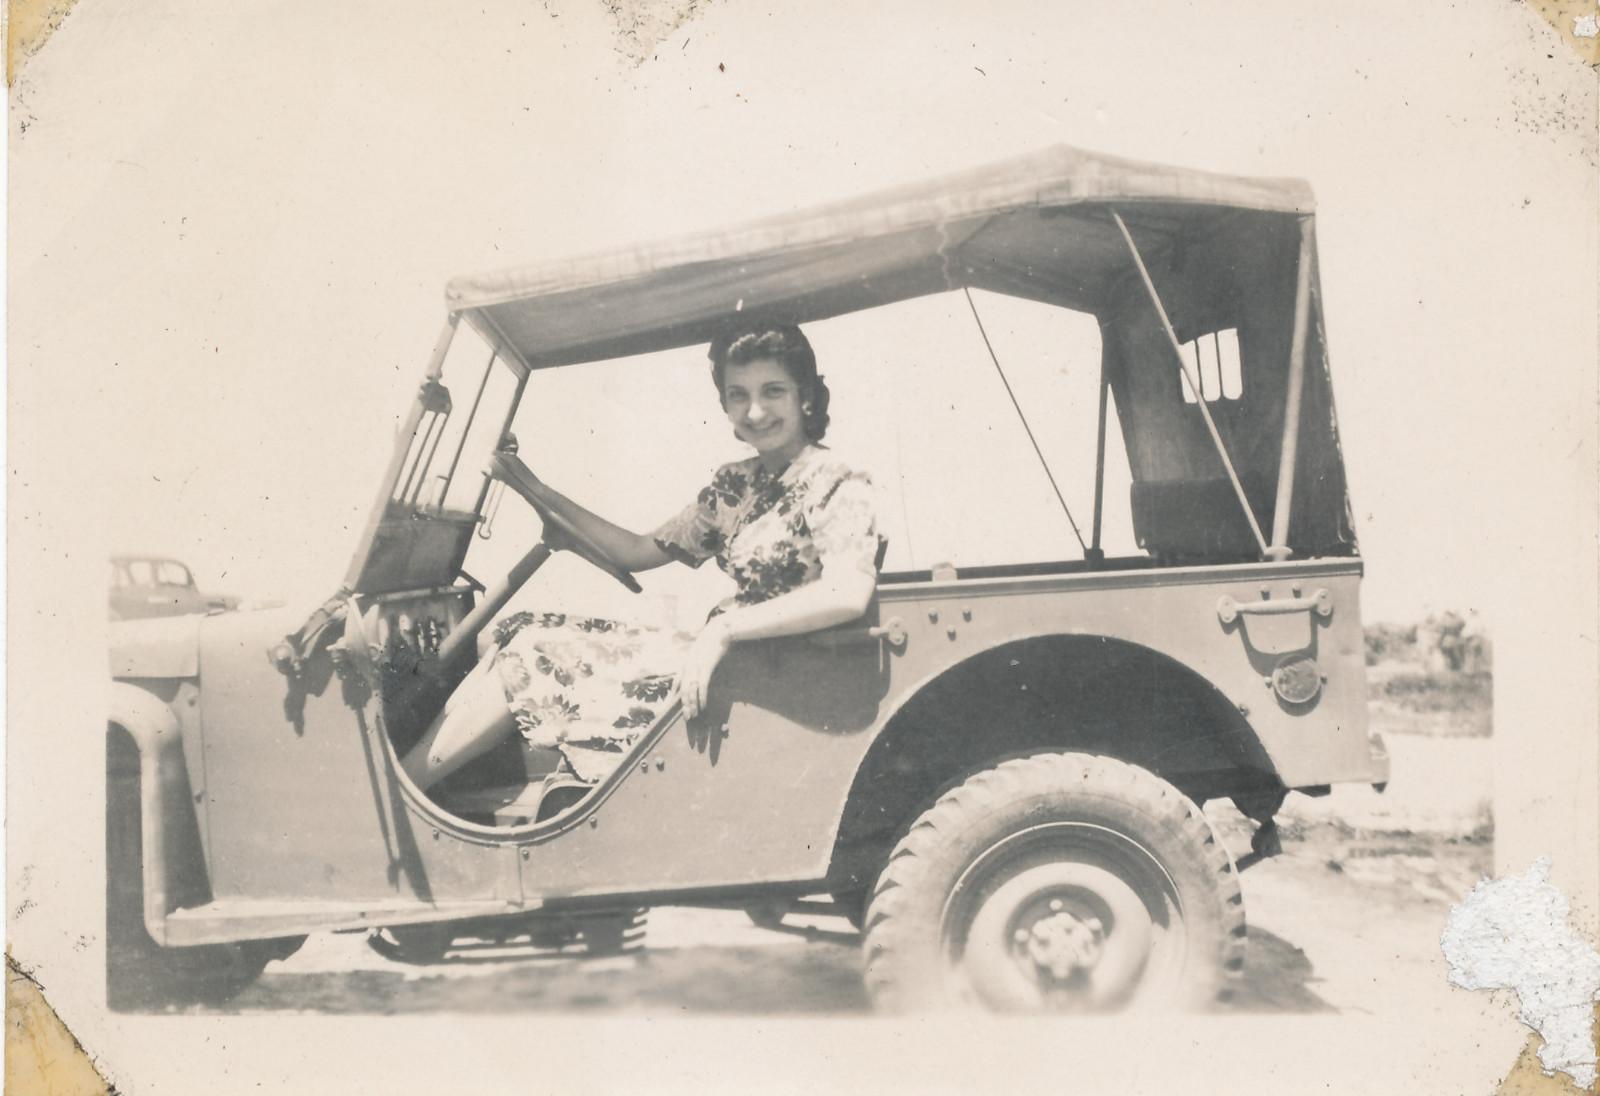 1941-bantam-brc40-woman